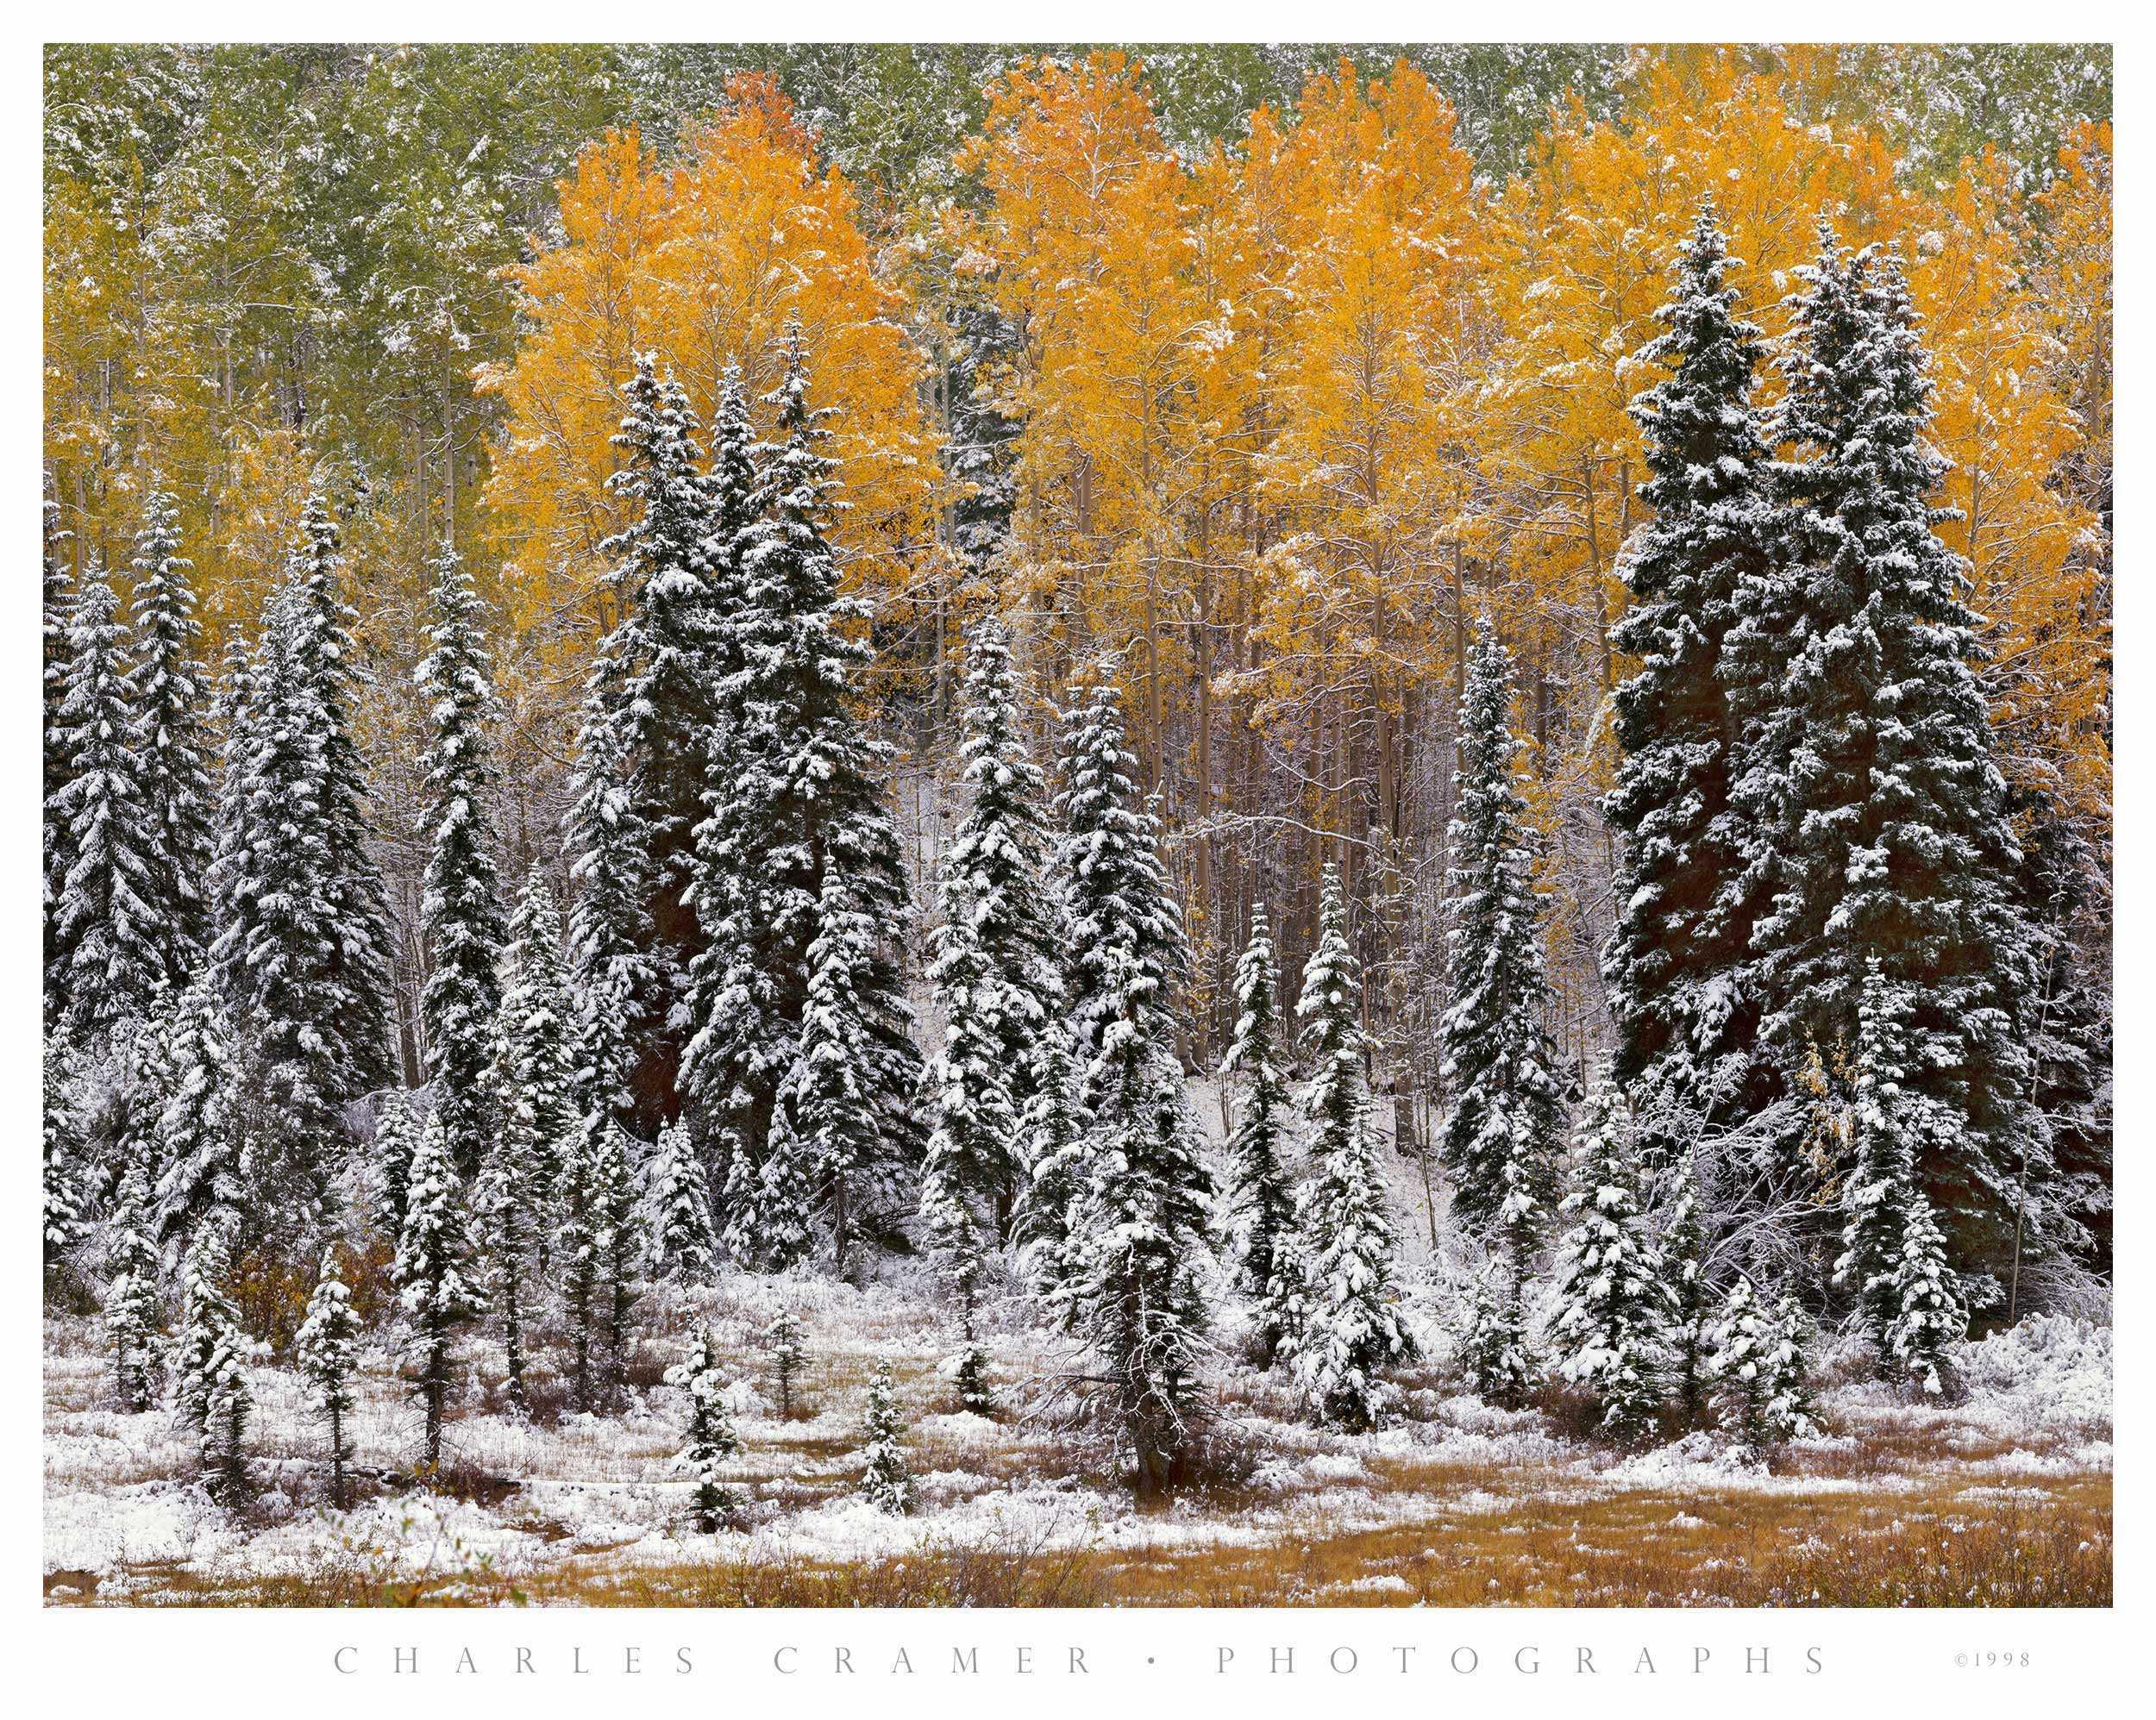 Autumn Snowfall, near Telluride, Colorado